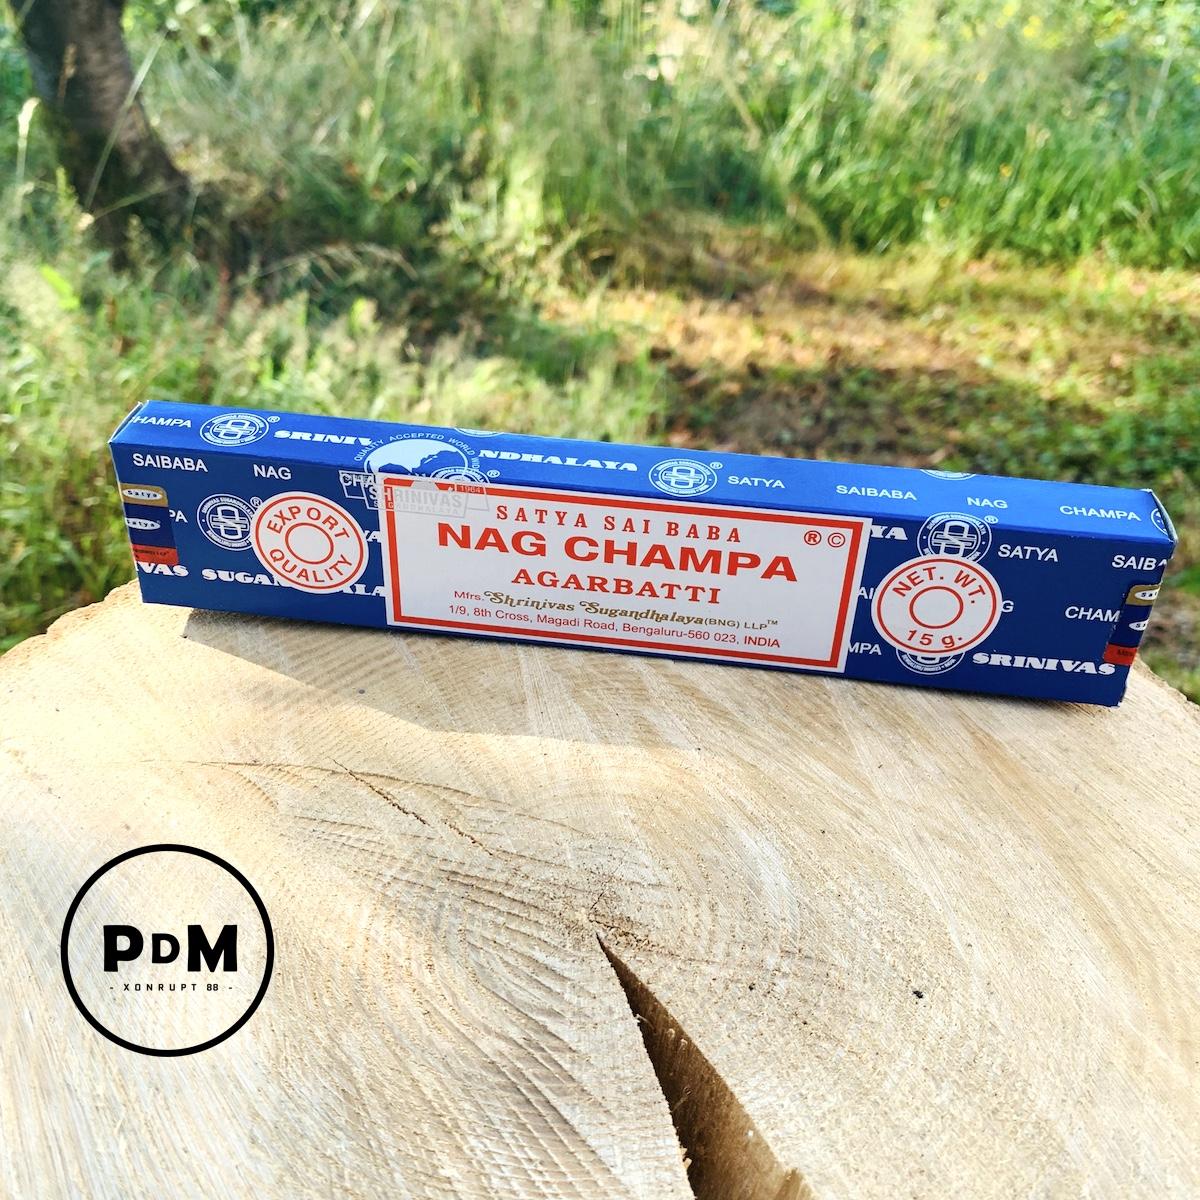 Encens Satya Sai Baba Nag Champa Argarbatti paquet de 15g